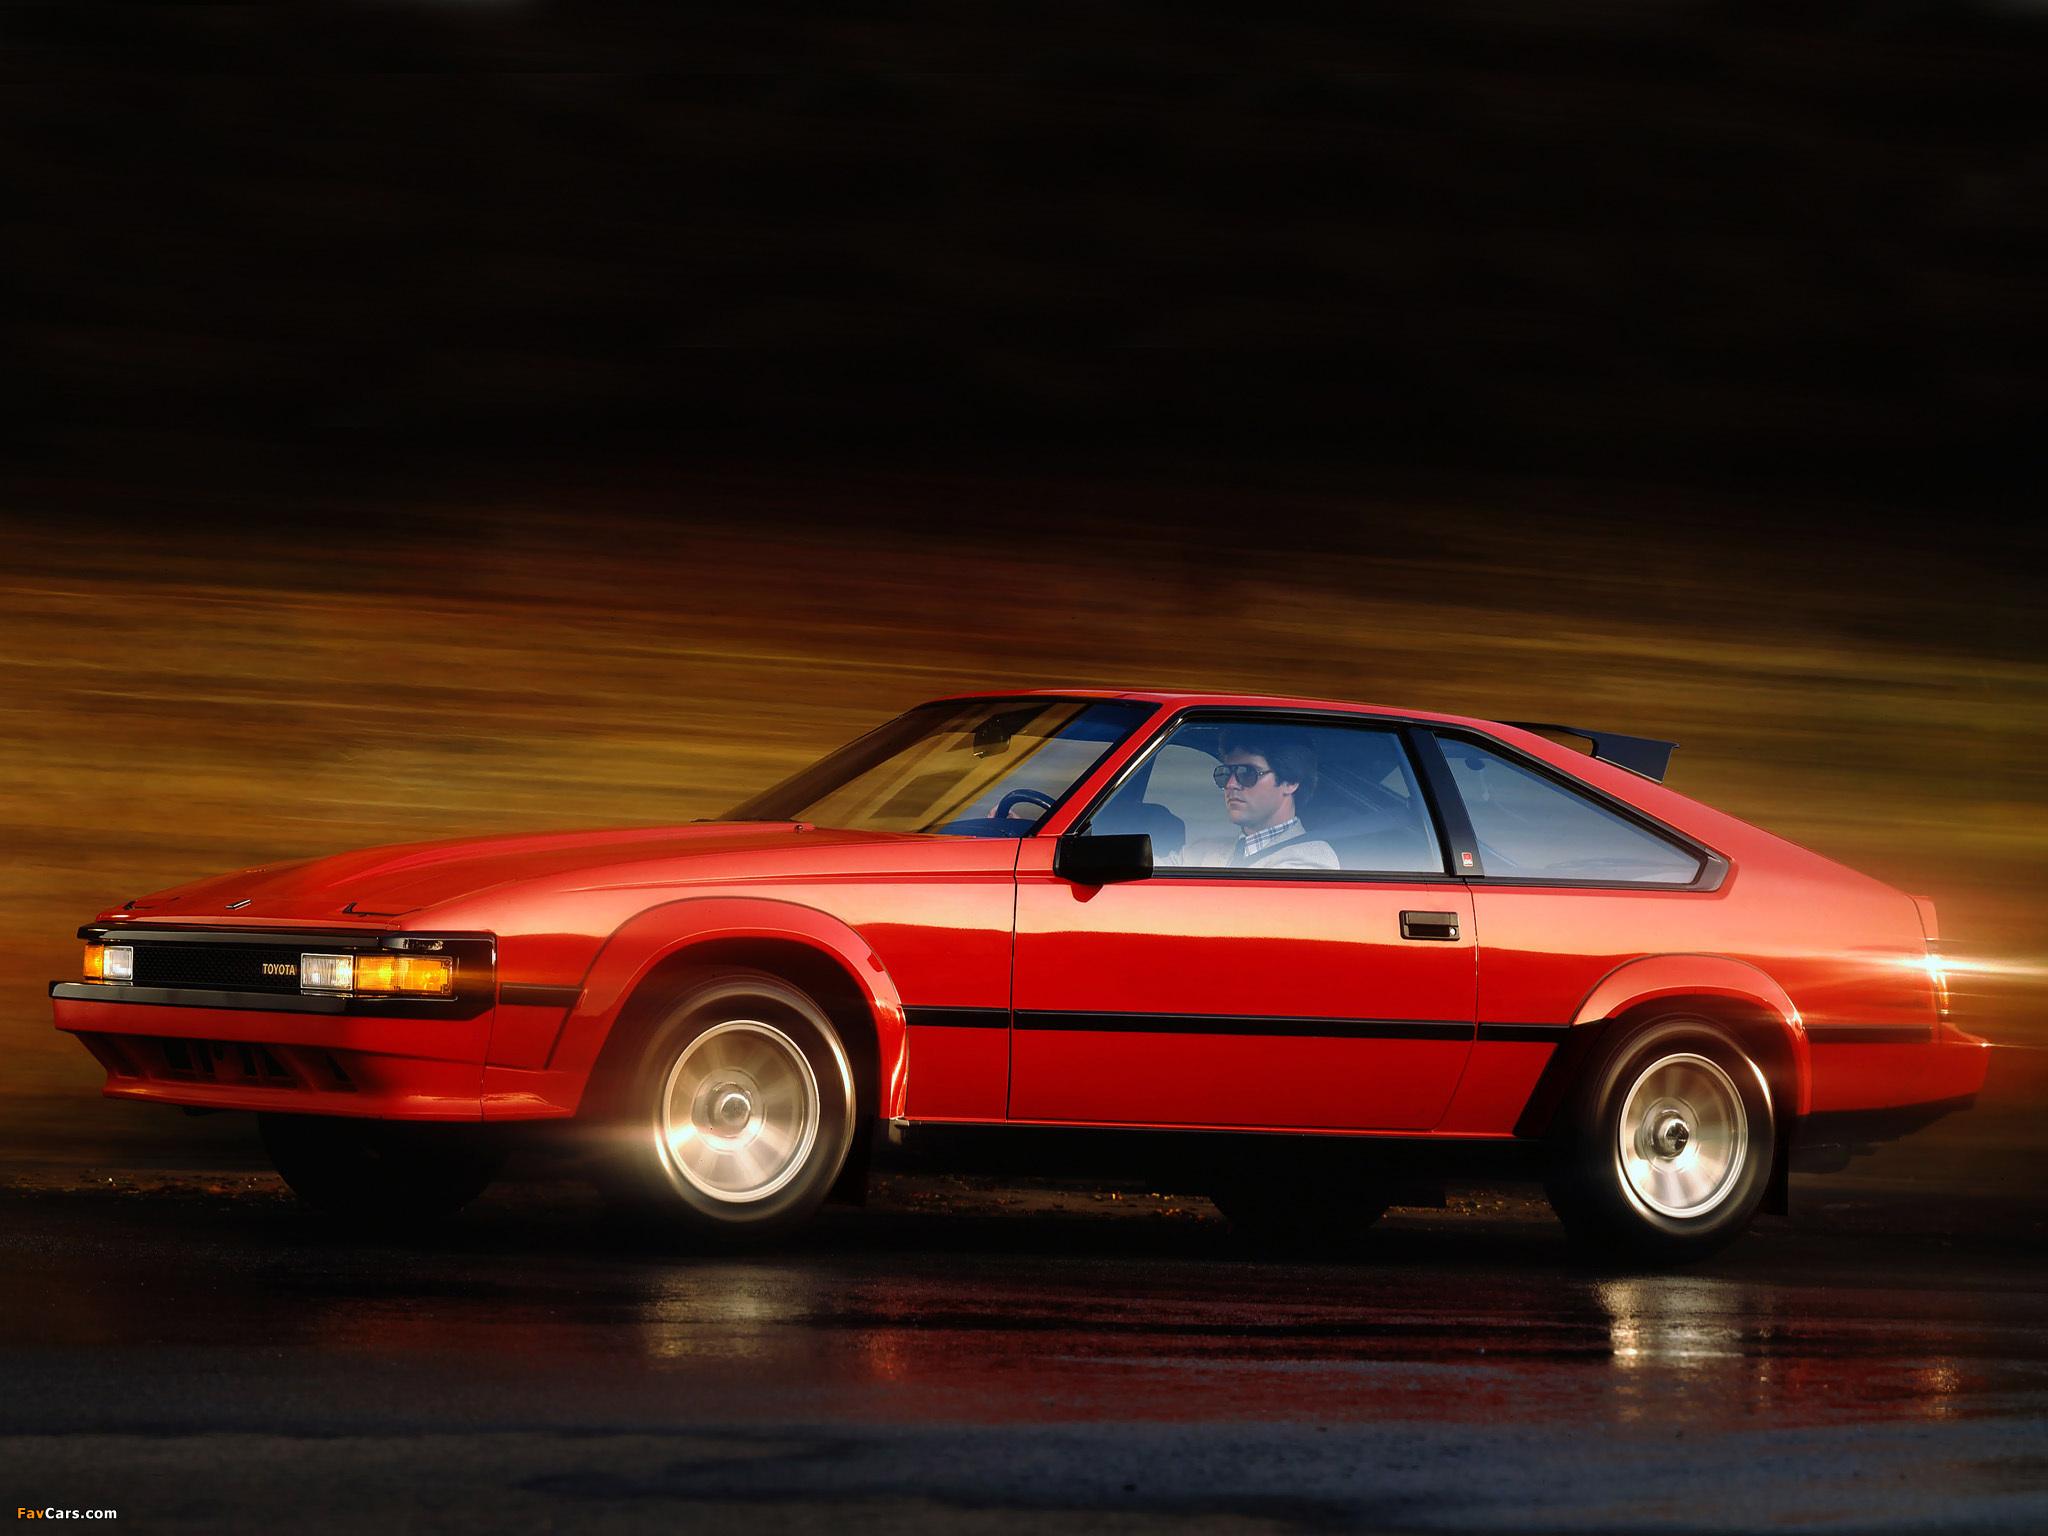 Toyota Celica Supra Ma61 1984 86 Images 2048x1536